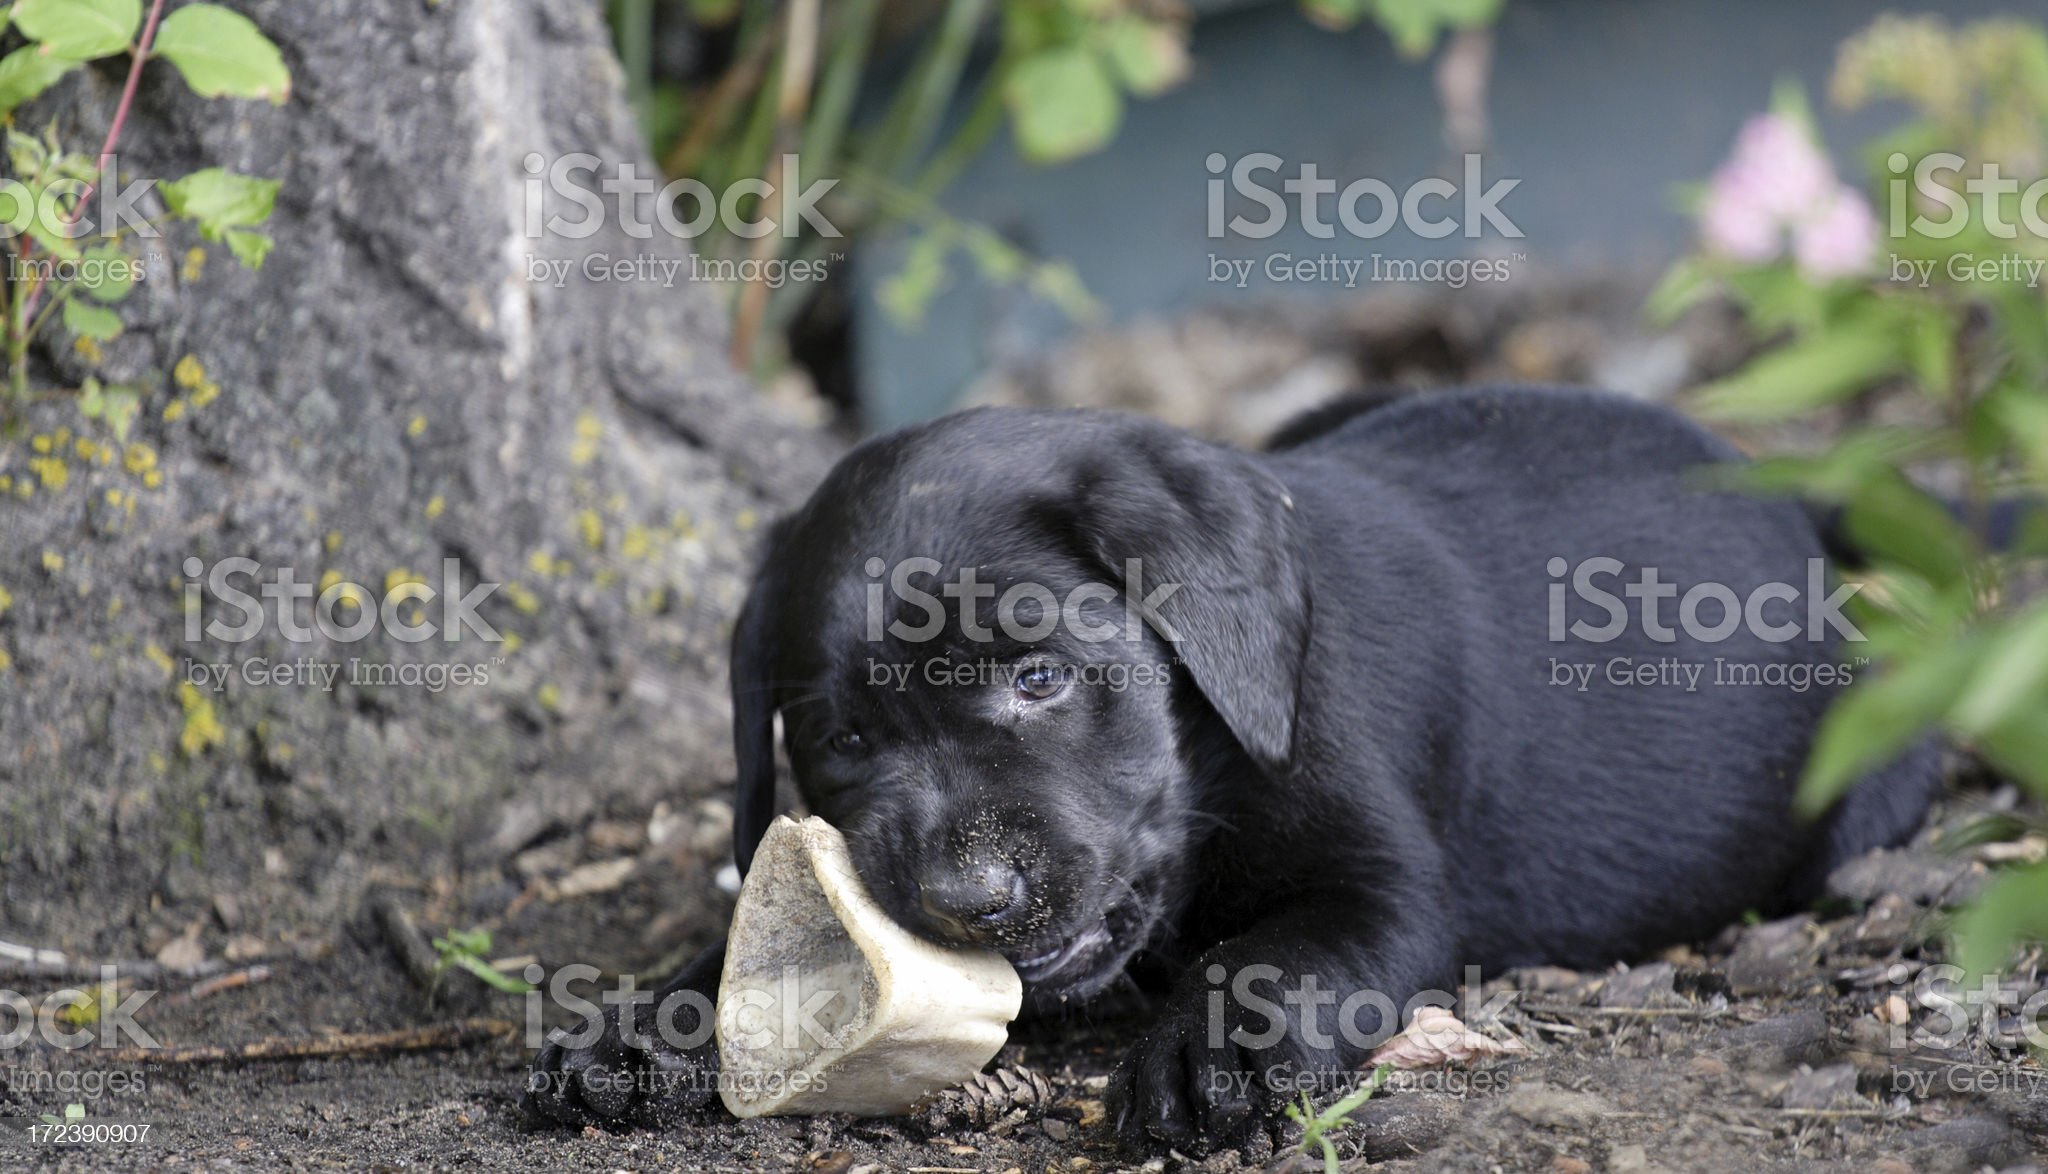 Black Labrador Retriever Puppy royalty-free stock photo